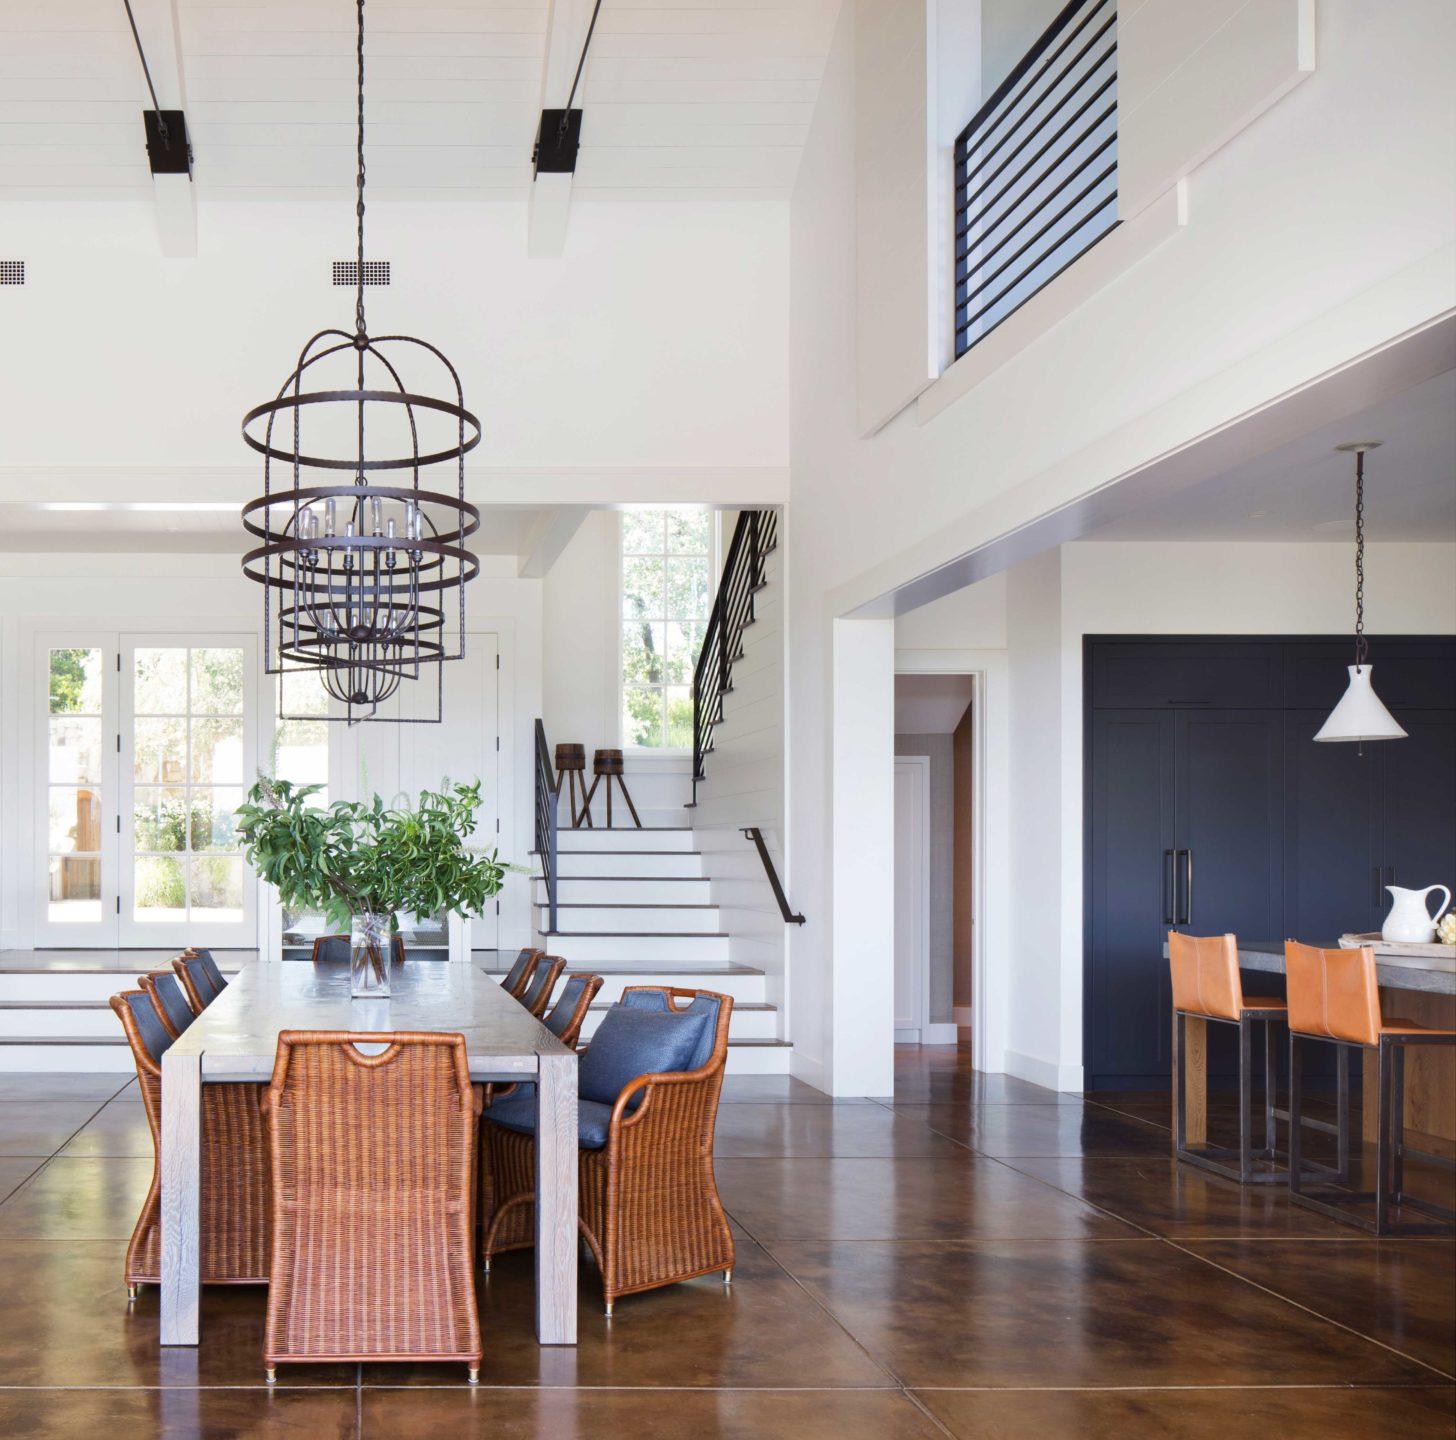 Jennifer_robins_interiors_projects_st_helena_DR_dining_room_3Fish_15_HR_crop